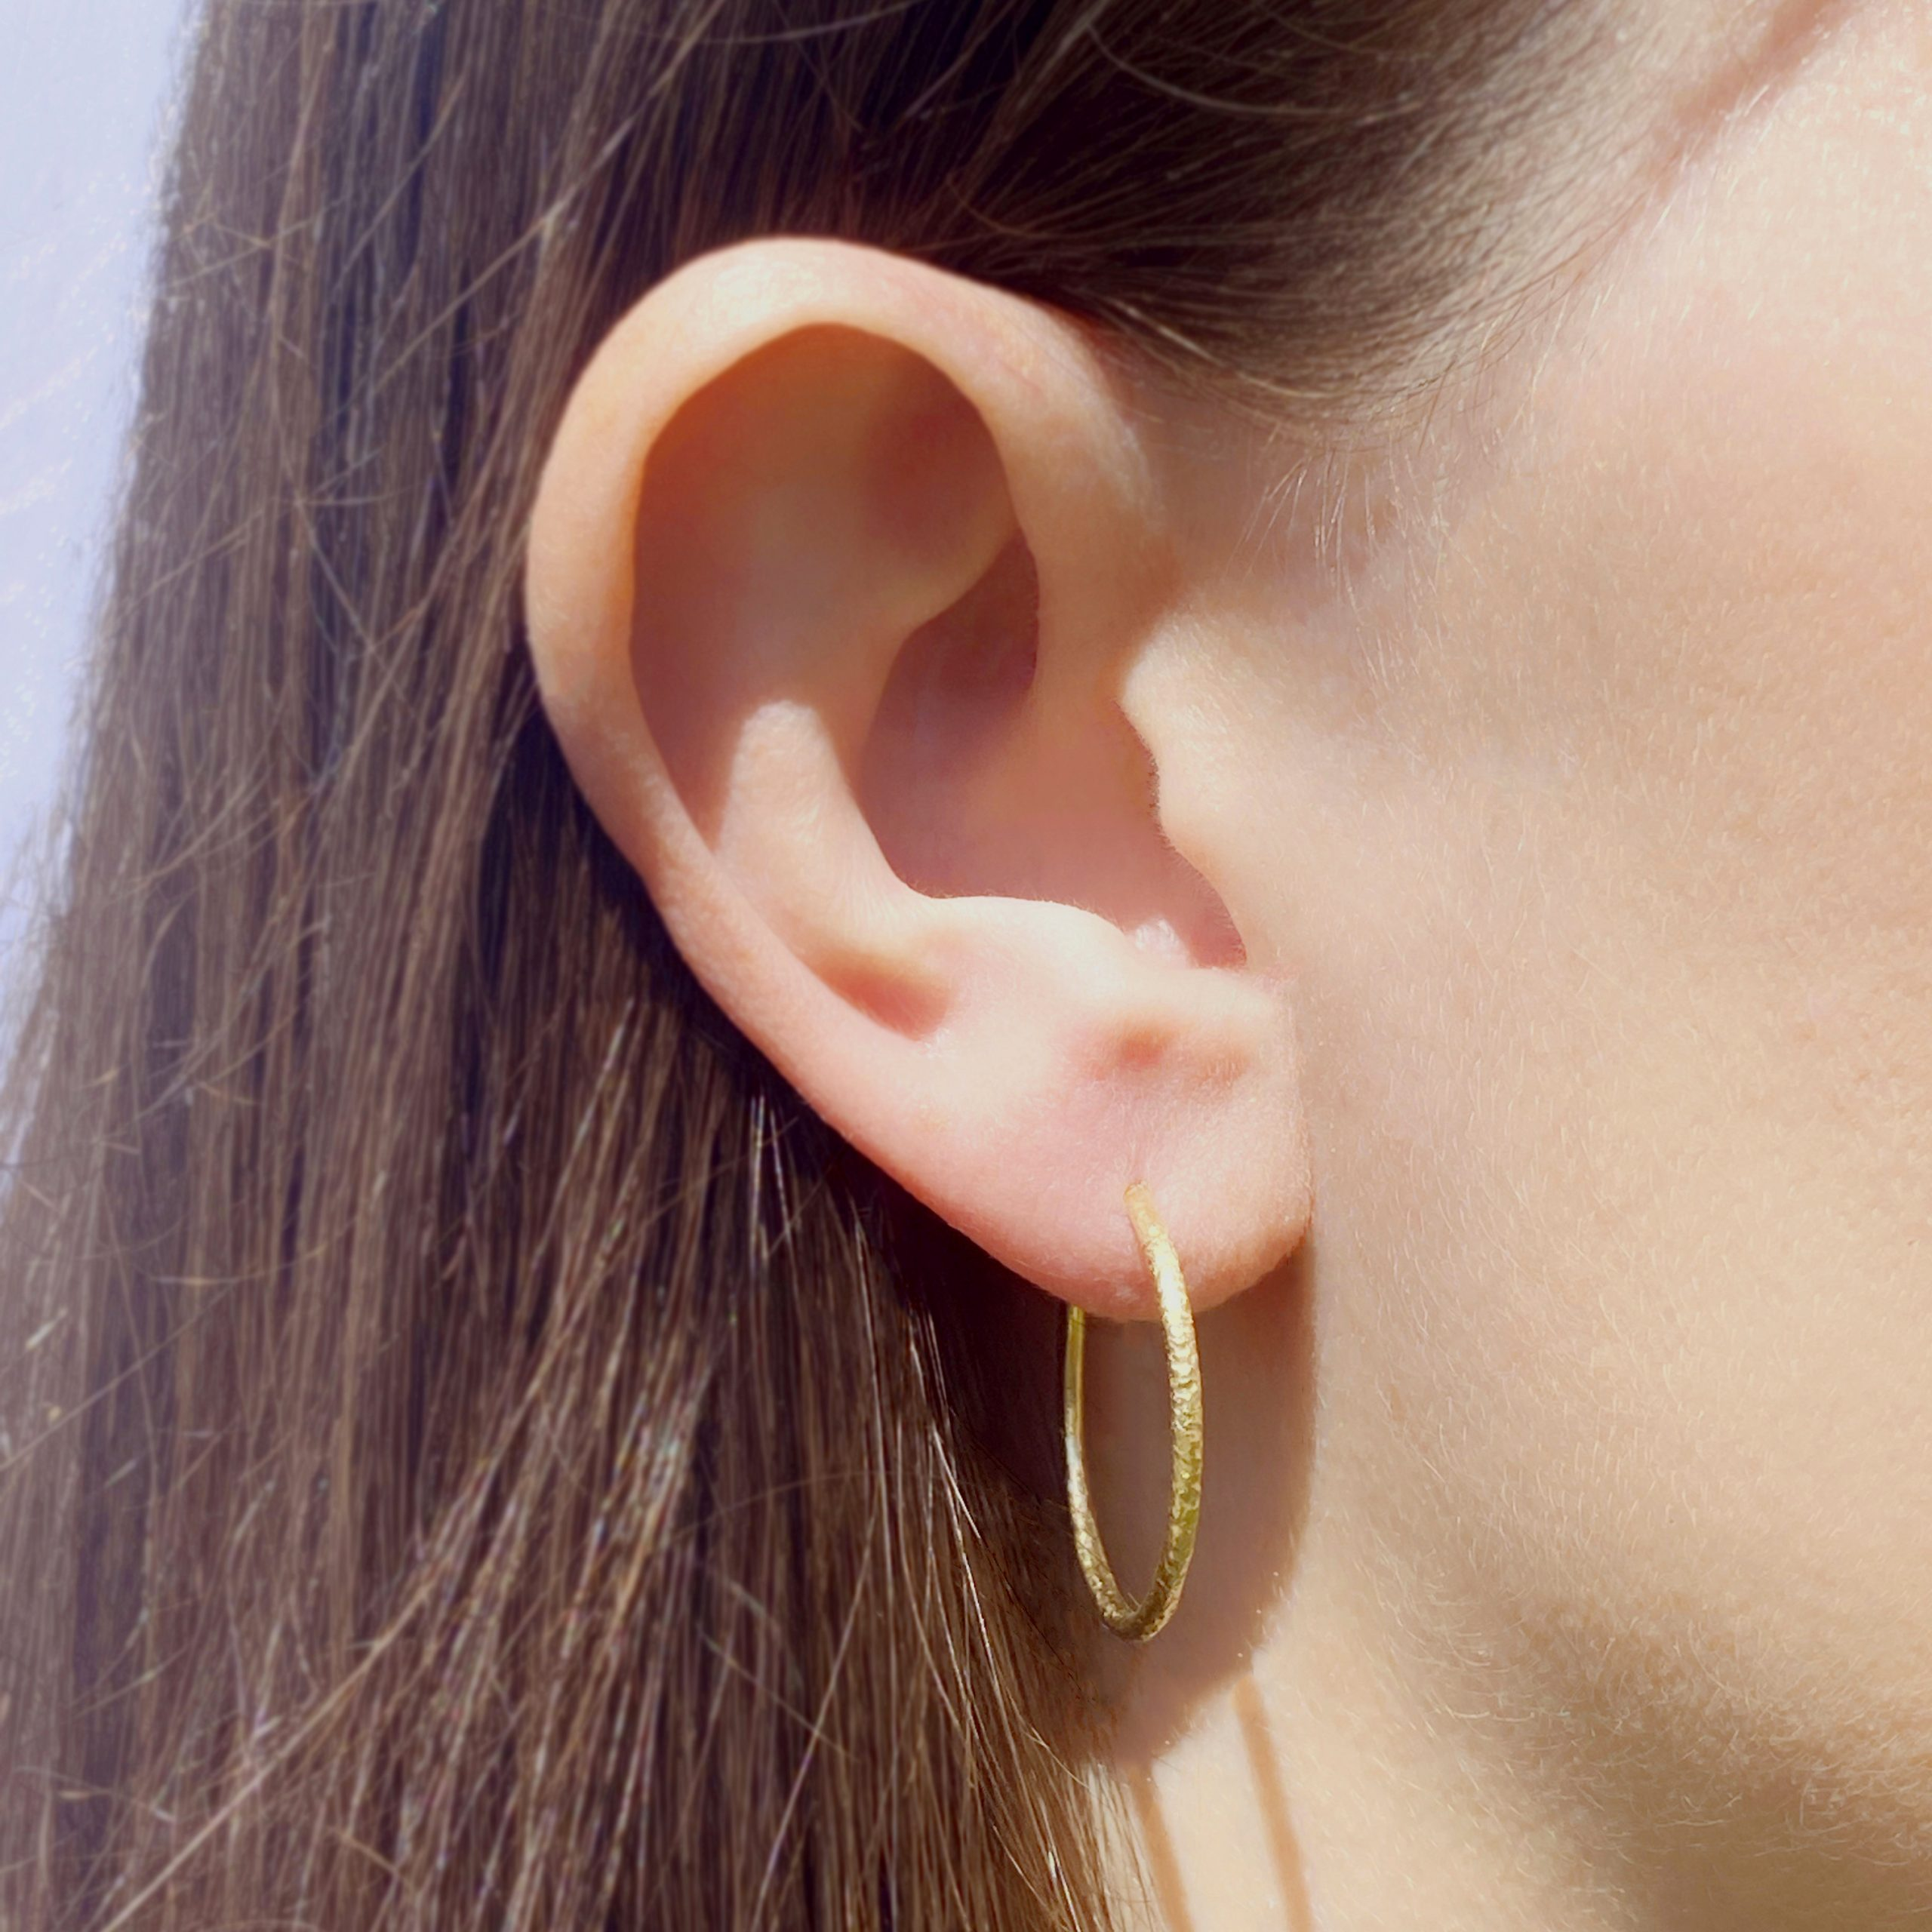 Gaia Textured 18ct Yellow Gold Hoop Earrings 20mm